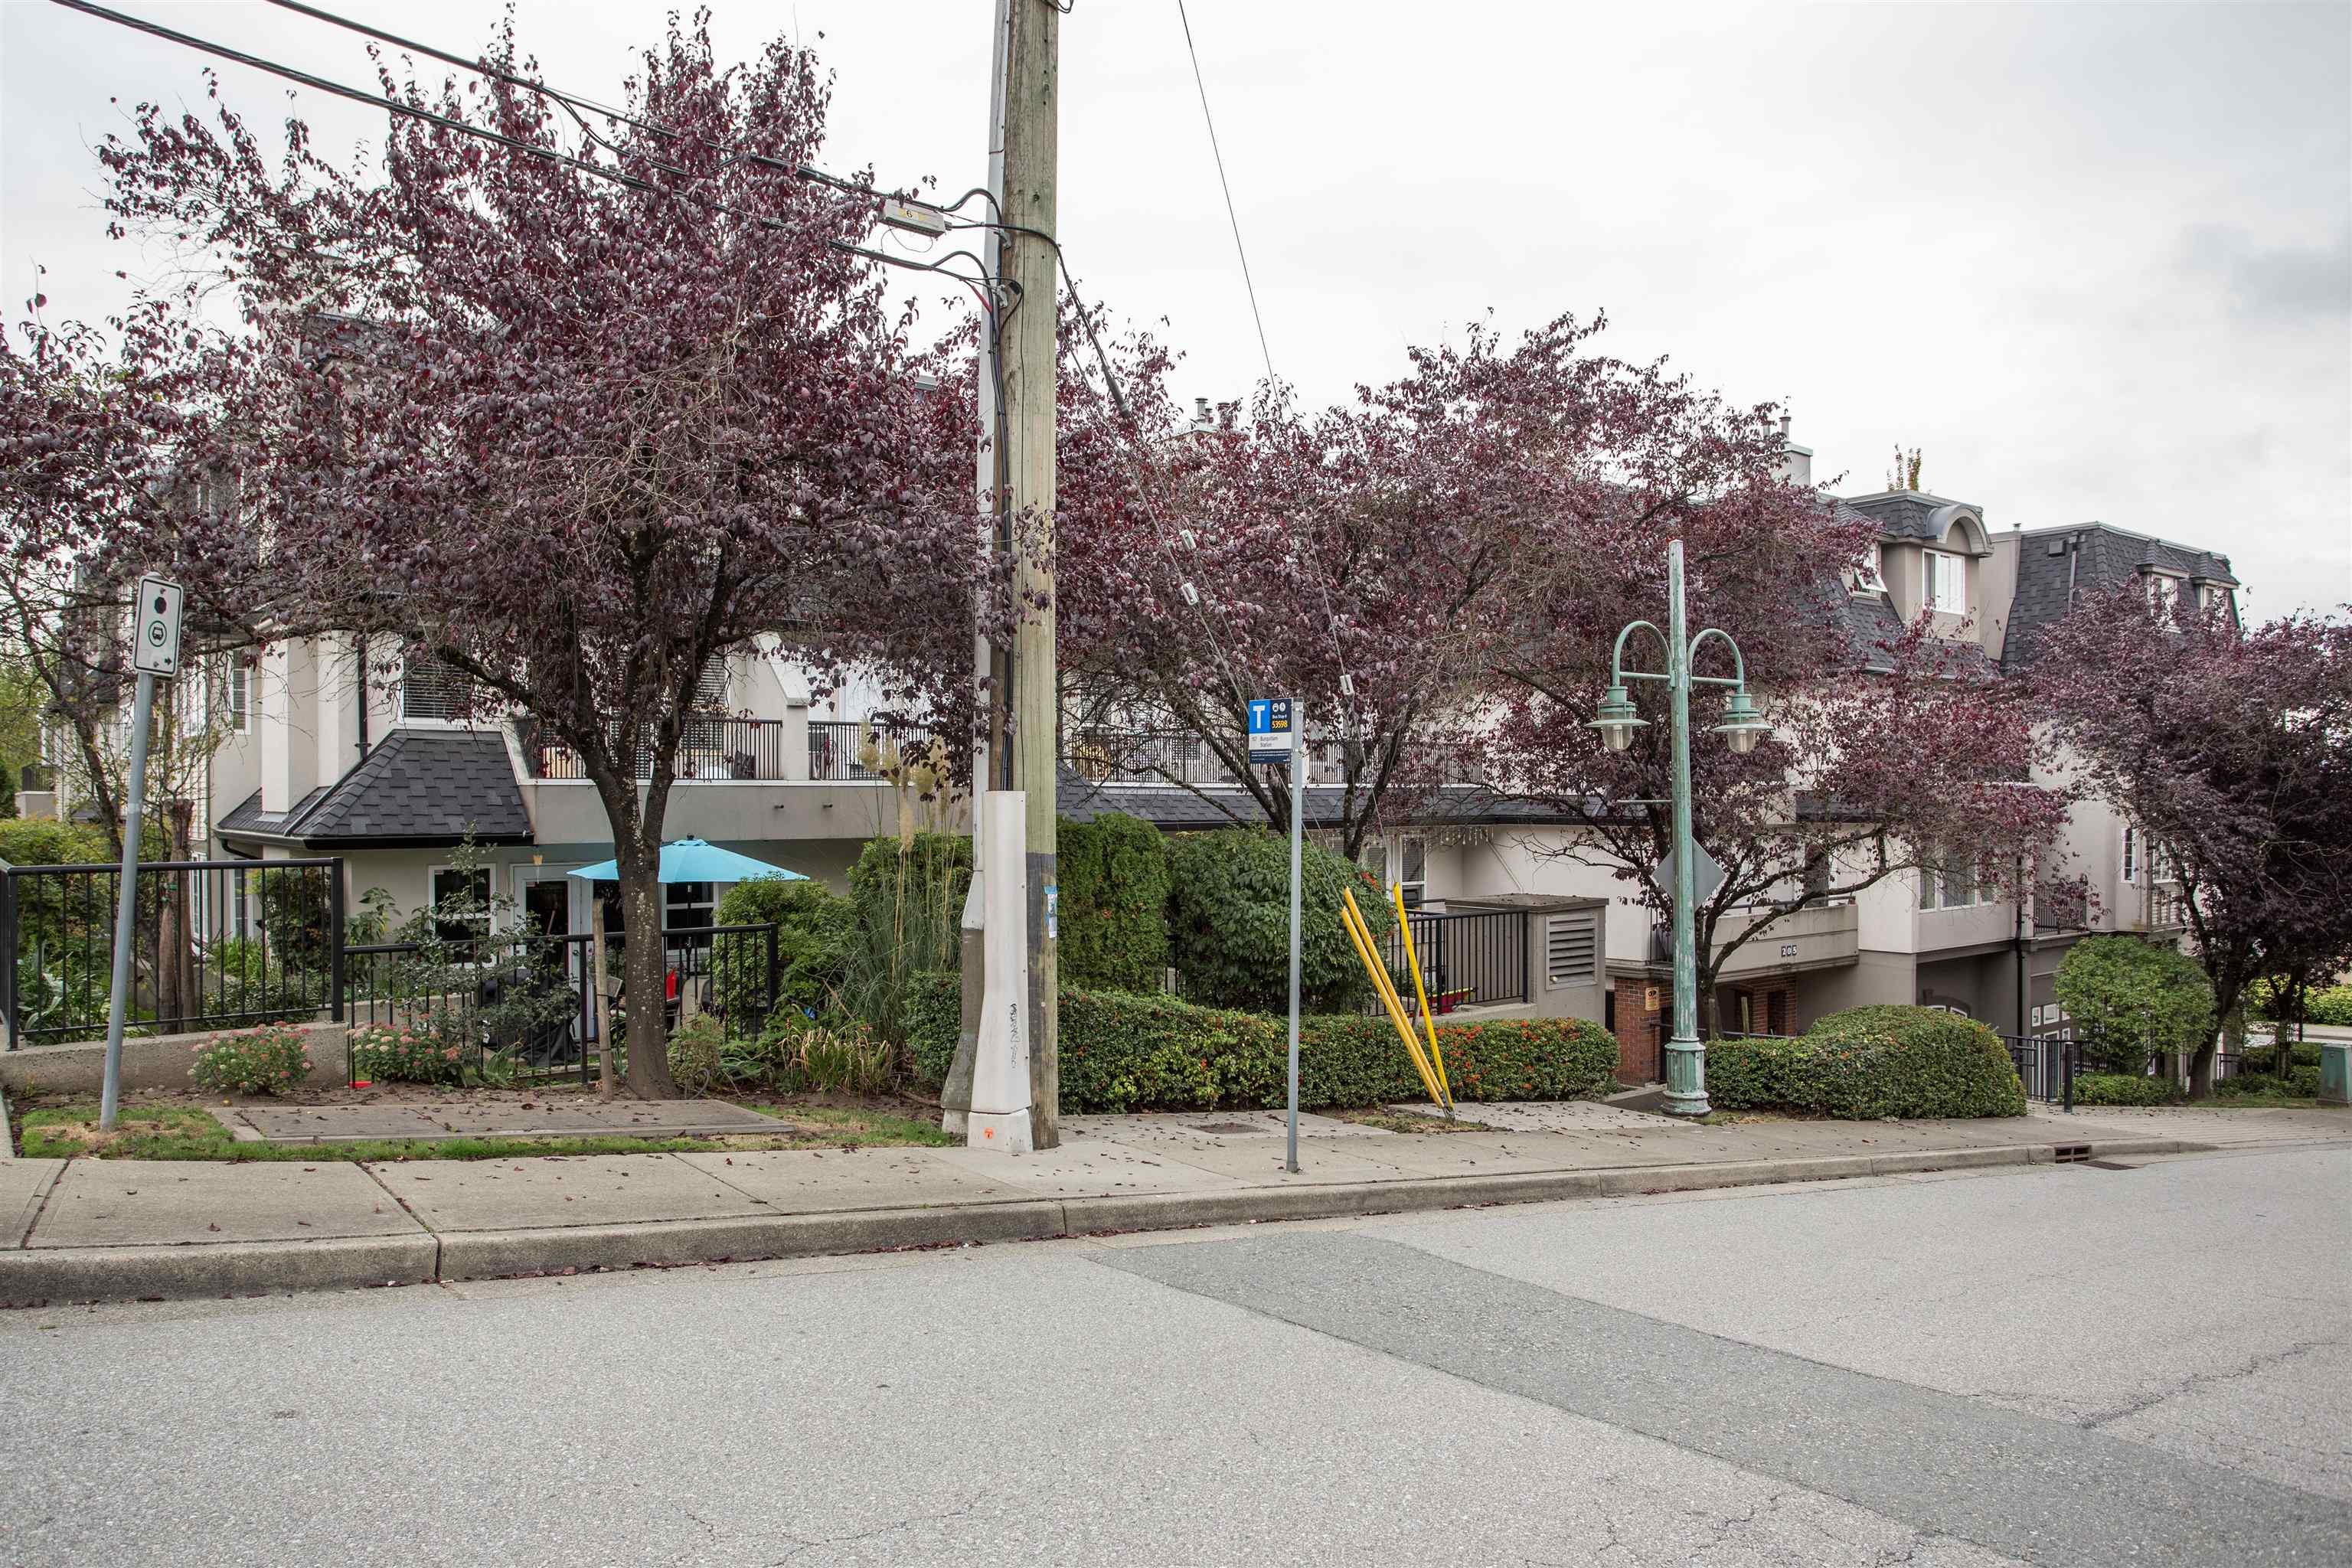 7 205 LEBLEU STREET - Maillardville Apartment/Condo for sale, 3 Bedrooms (R2625671) - #29